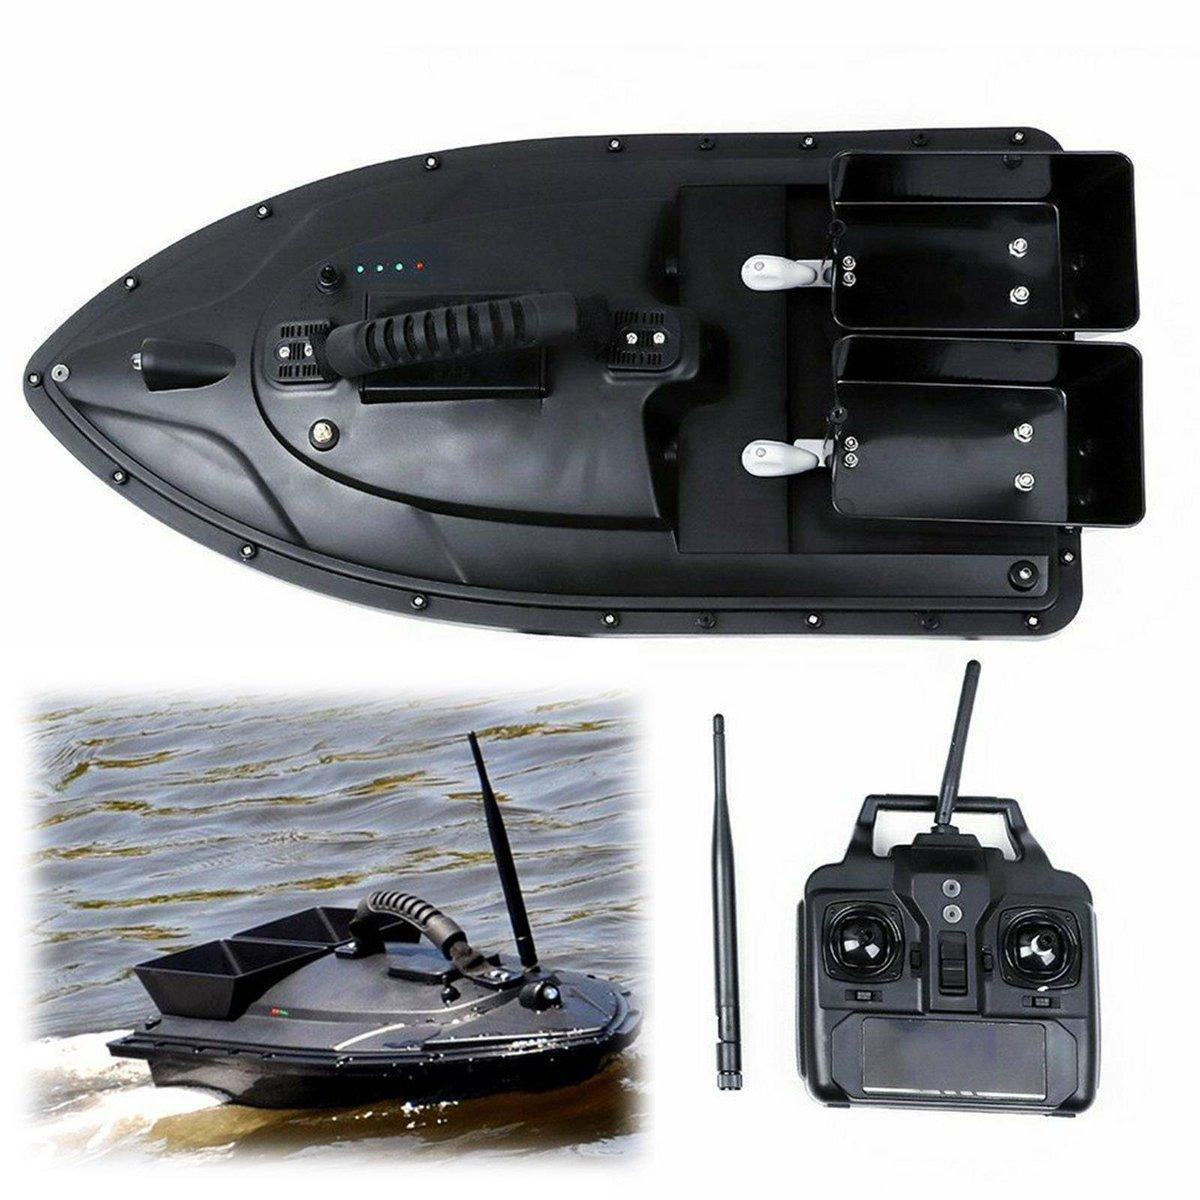 Ad - Cheap Bait Boat On eBay here -->> https://t.co/0x6o2G0Pz5  #carpfishing #<b>Bait</b>boat